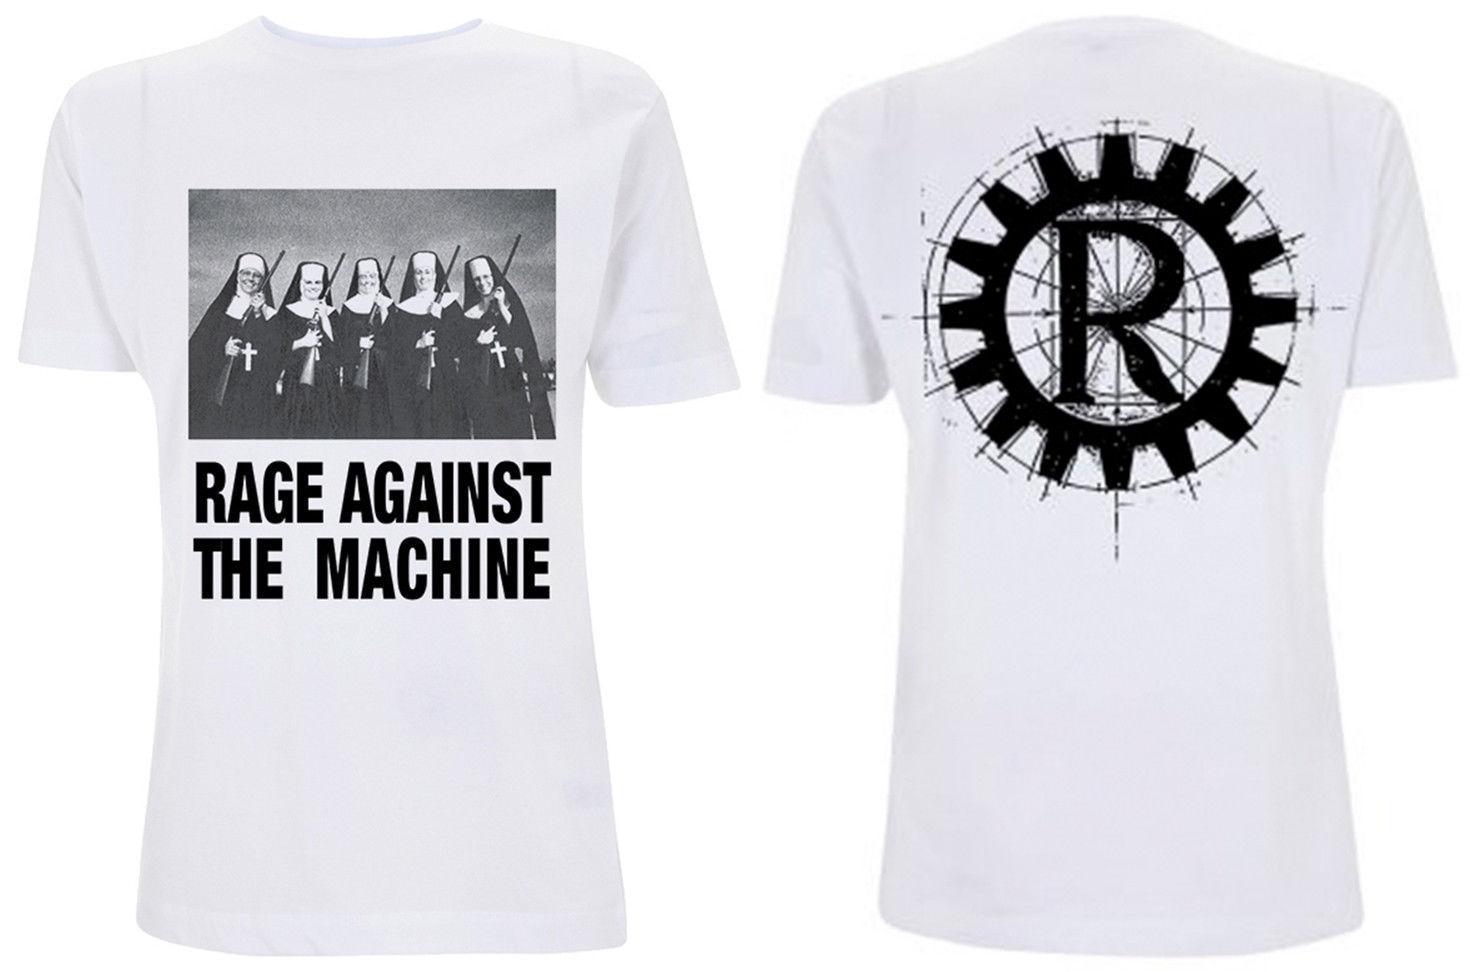 ddd855da67 Compre Camiseta Monjas Y Pistolas De Rage Against The Machine NUEVA Camiseta  Masculina OFICIAL OFICIAL